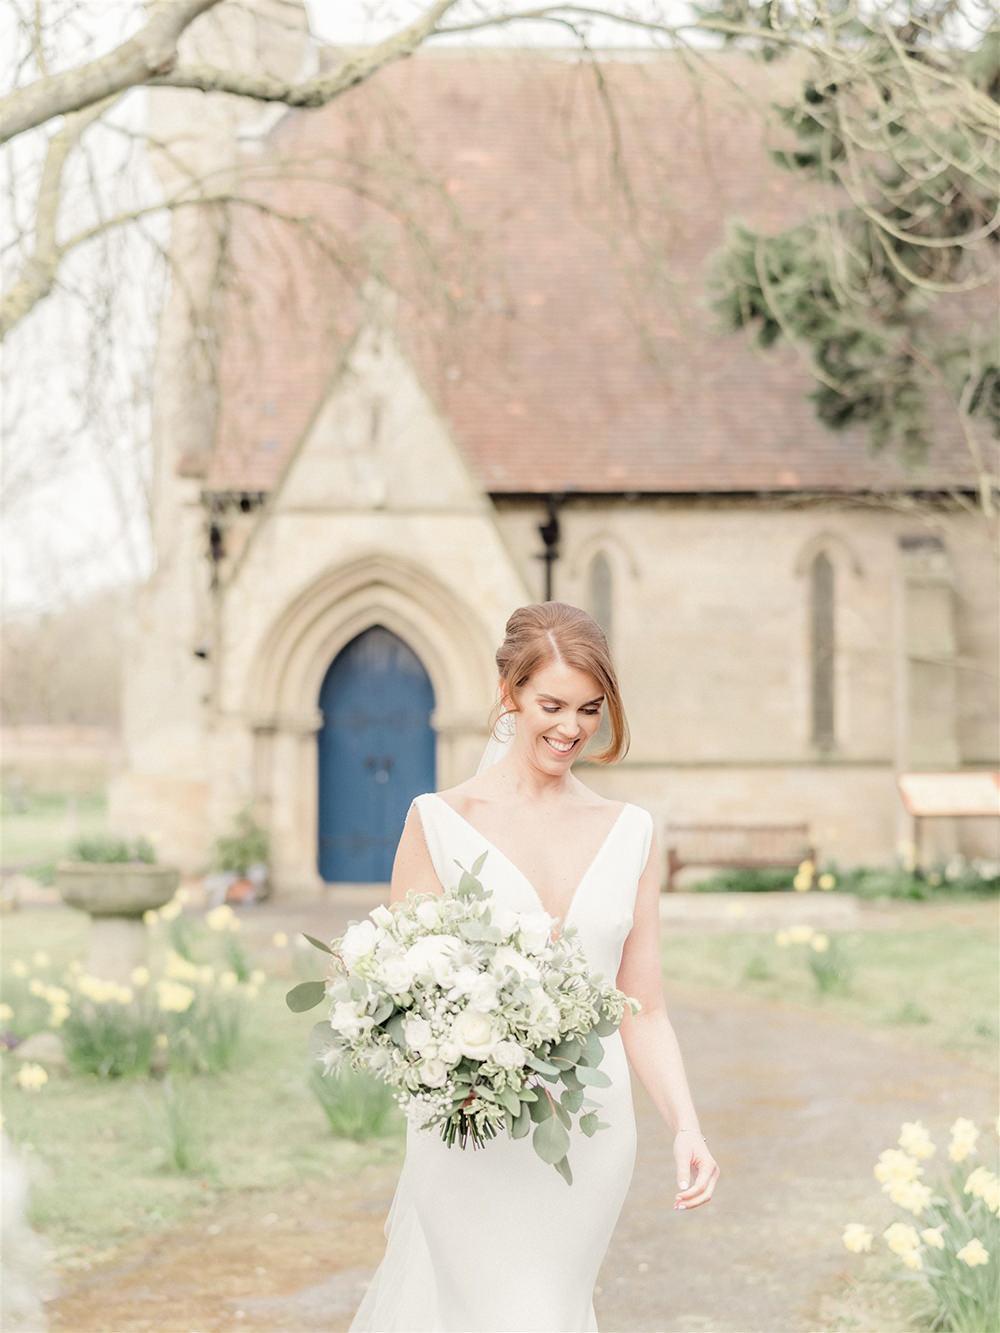 Dress Gown Bride Bridal Pronovias Straps Lockdown Wedding Carn Patrick Photography